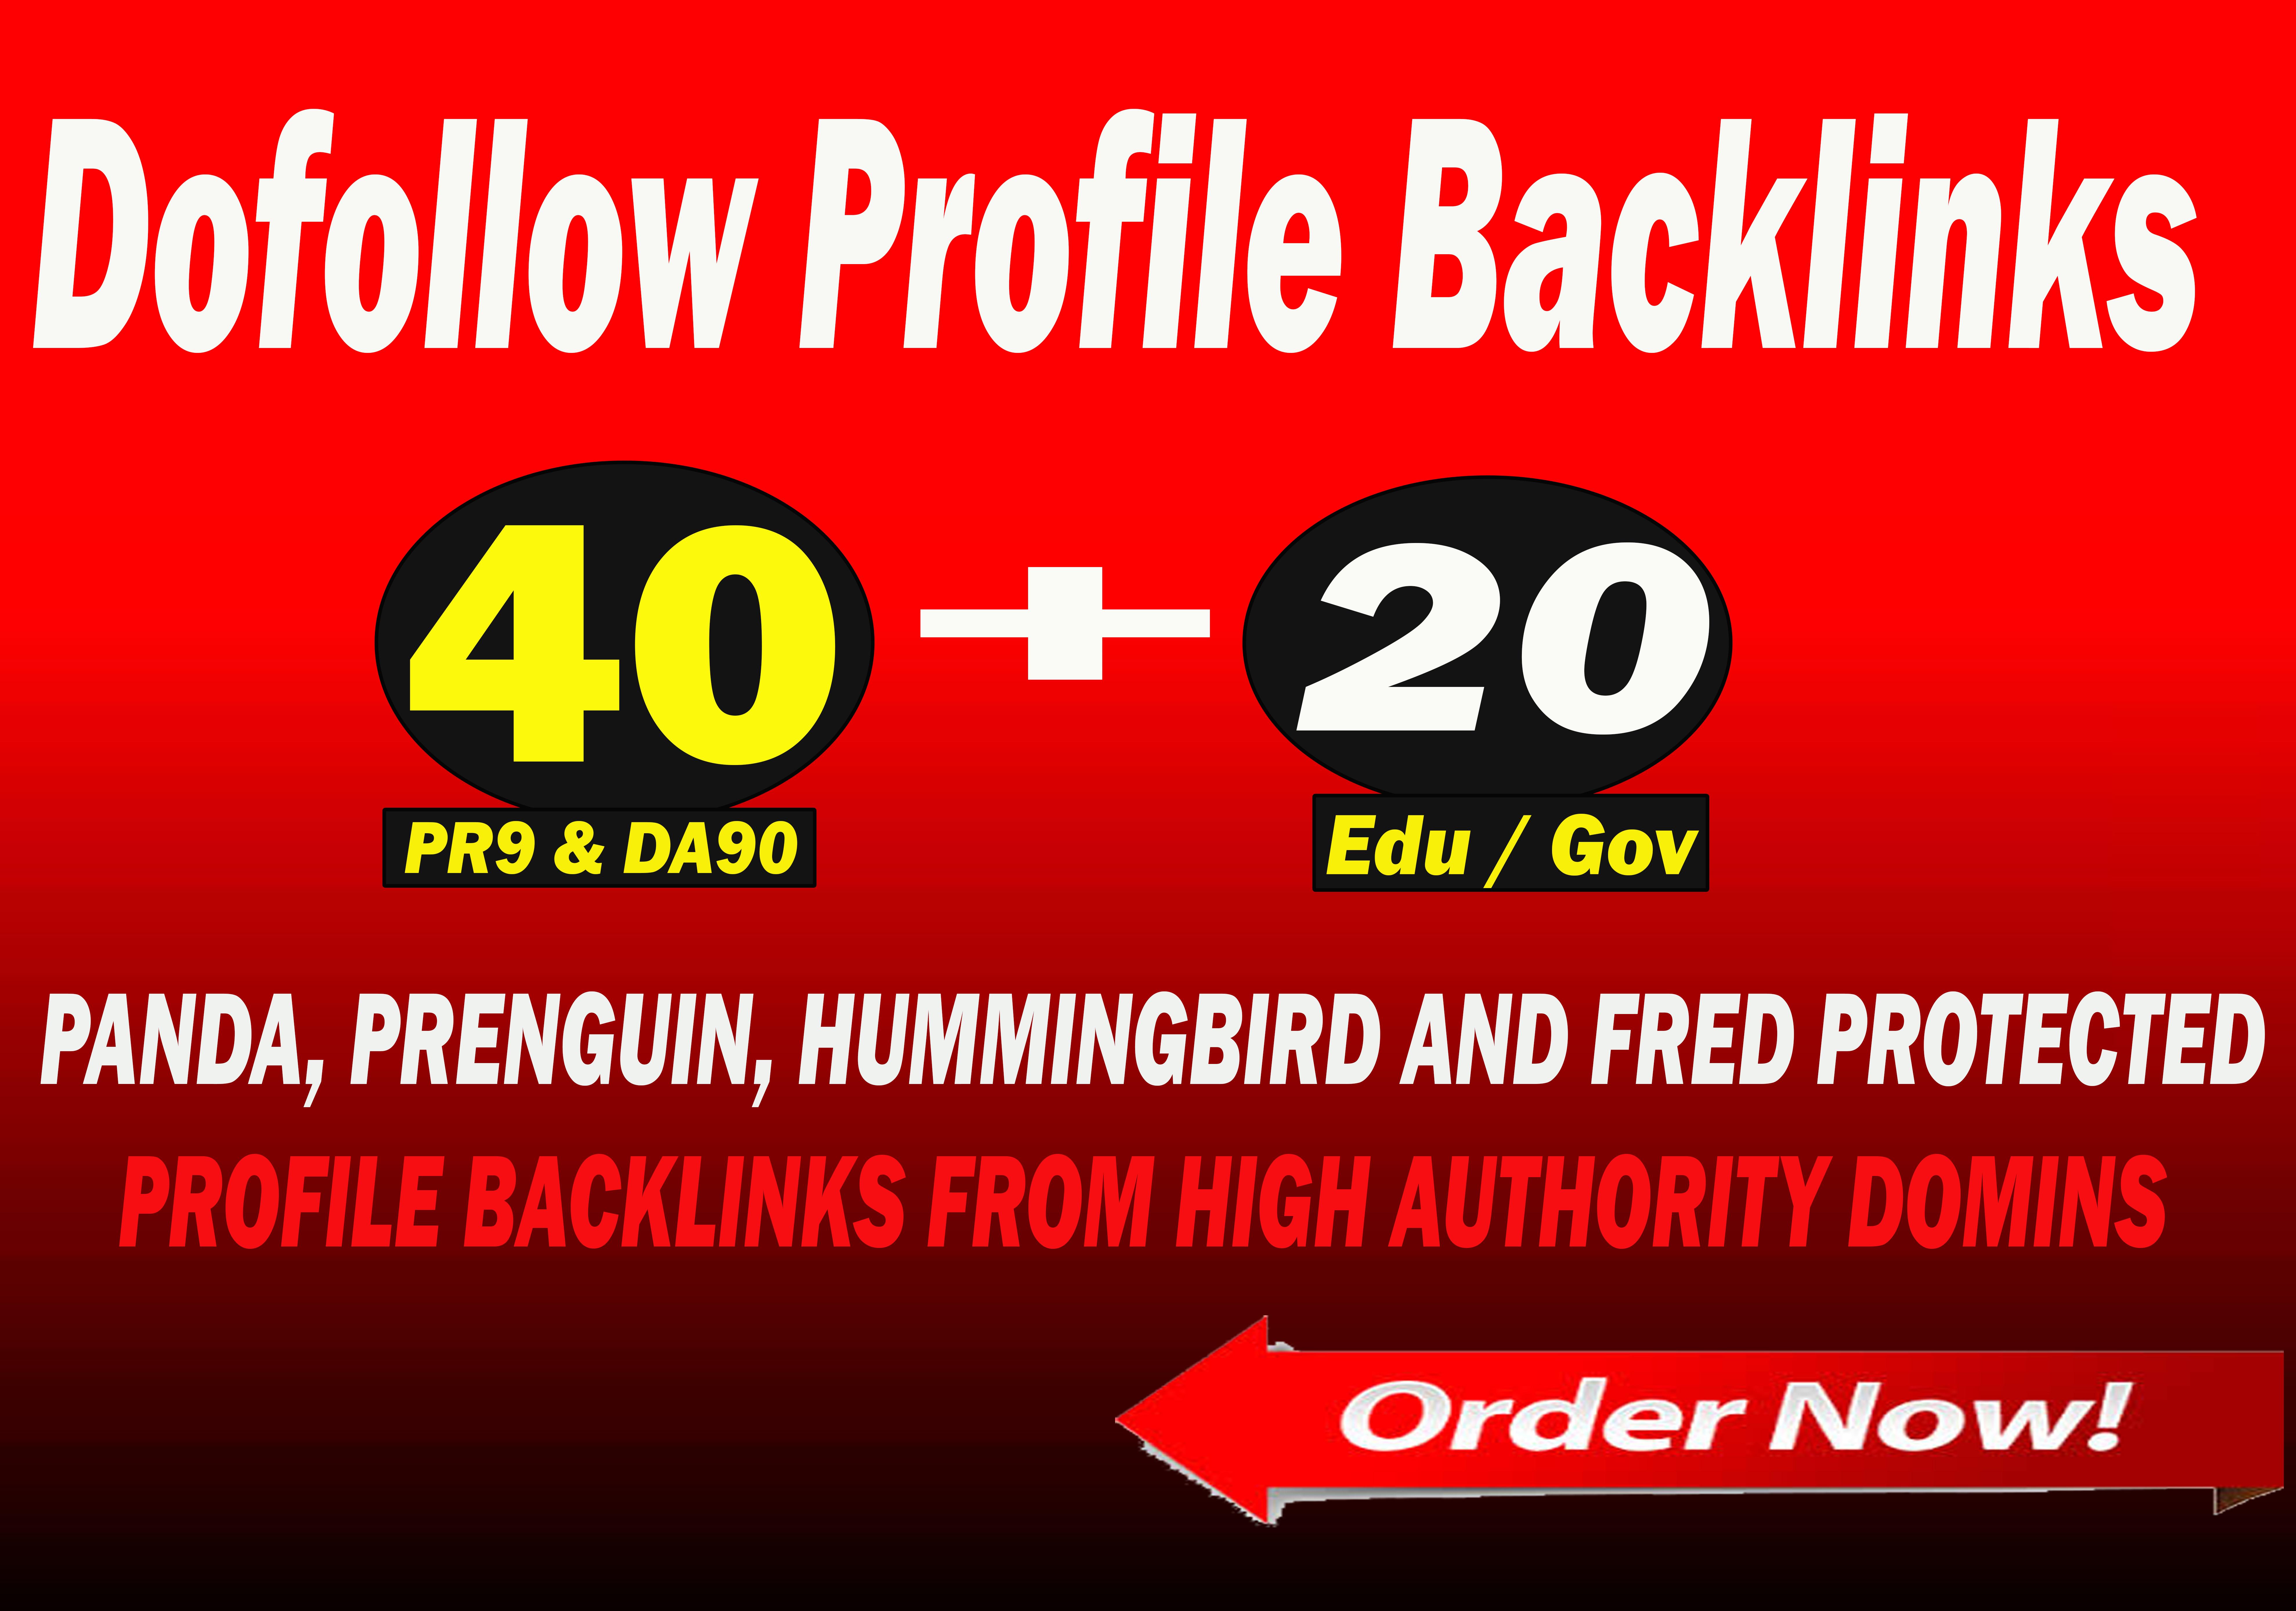 Create 40 Pr9 + 20 Edu - Gov SEO Authority Backlinks - Fire Your Google Ranking